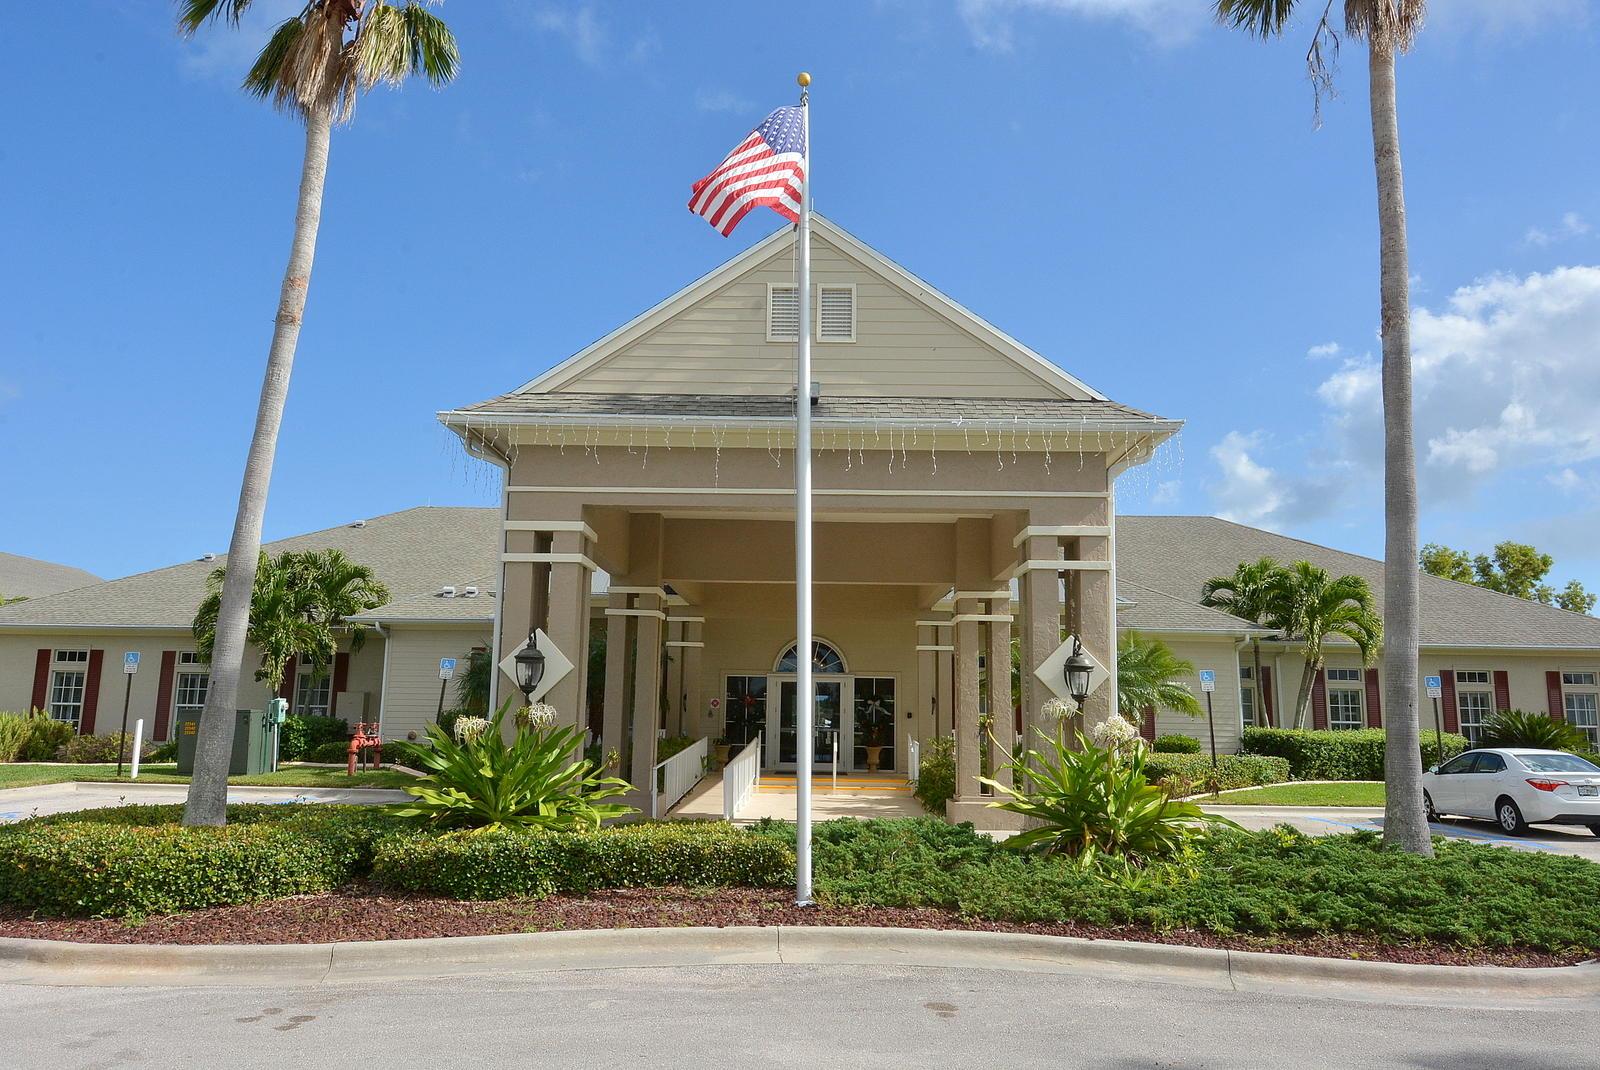 8141 Meadowlark Lane, Port Saint Lucie, FL 34952